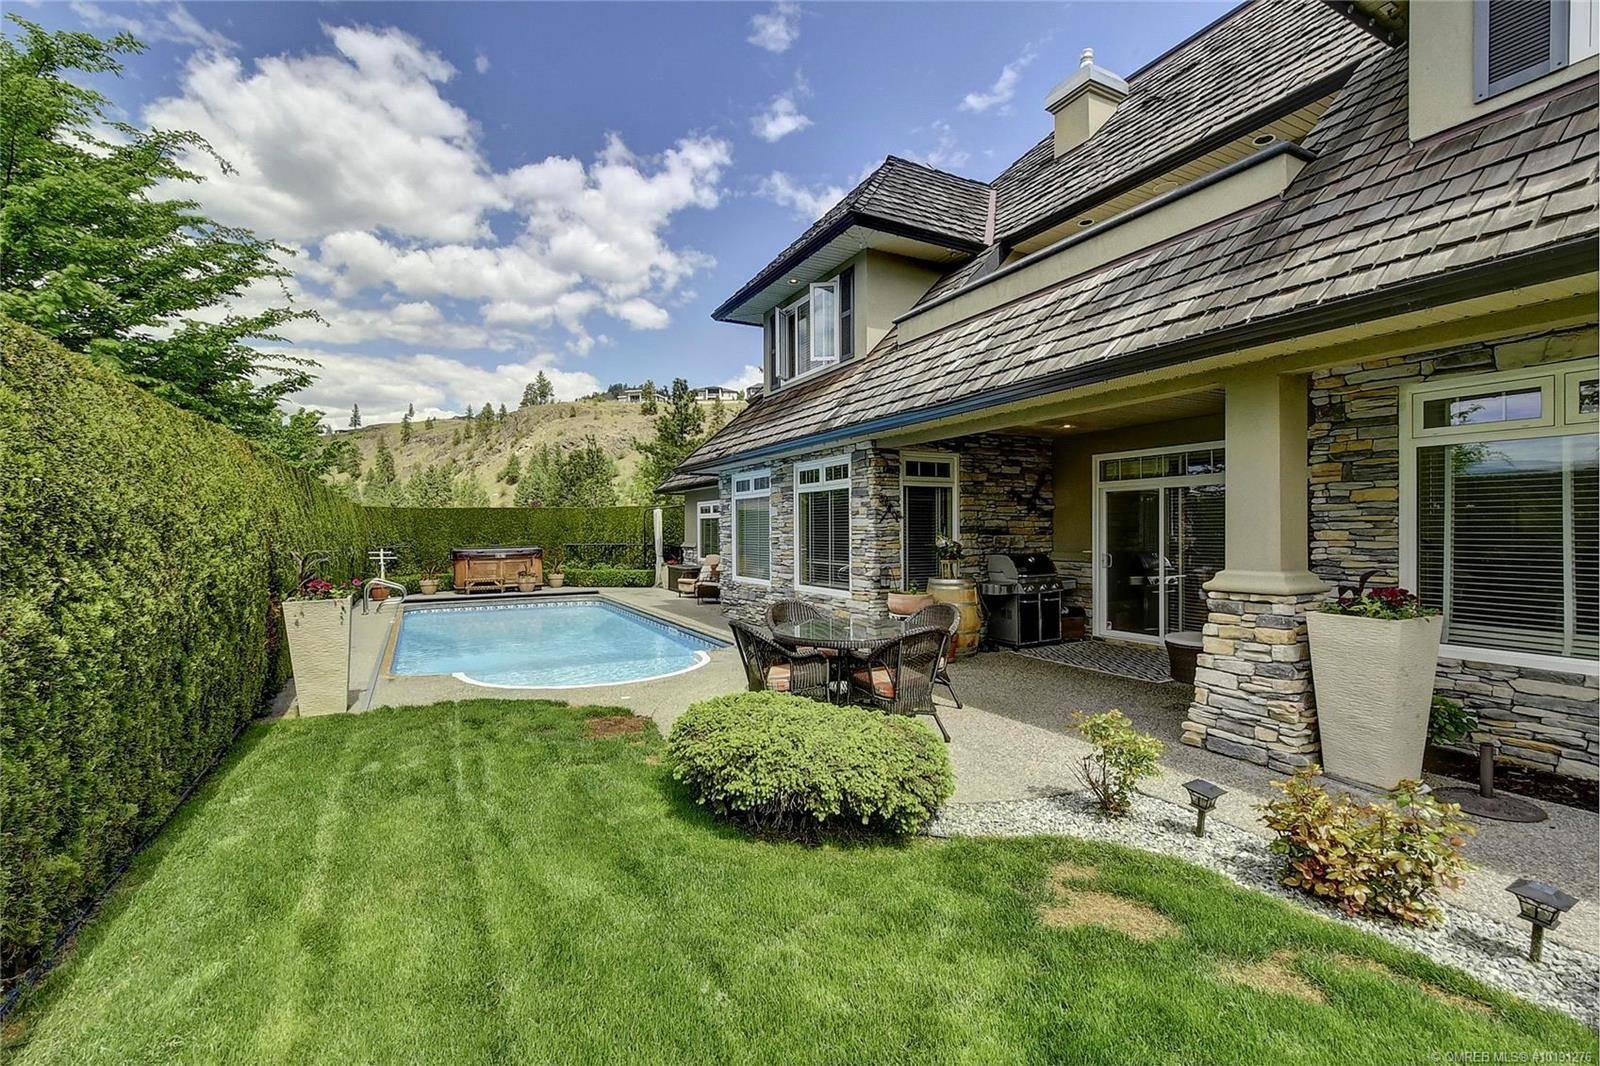 House for sale at 3385 Ridge Blvd West Kelowna British Columbia - MLS: 10191276